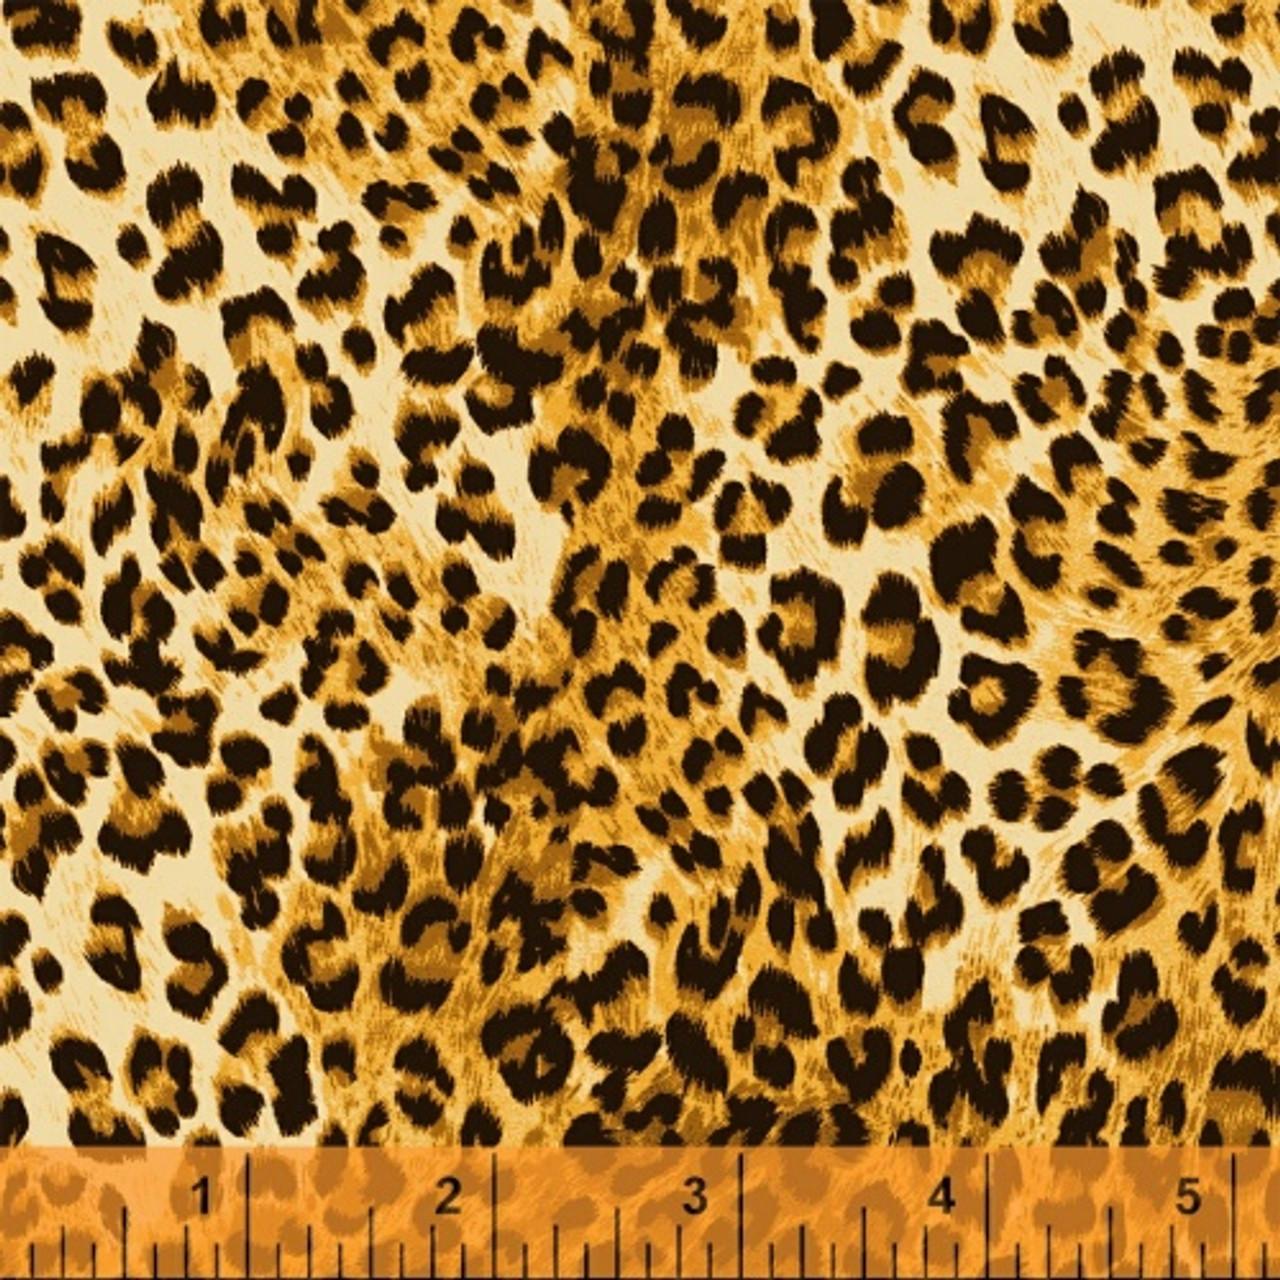 Lightweight Draping Sheer  Animal Print  Jungle 1 Yd 24 Leopard Chiffon Black  Charcoal Gray F0648 Deadstock Apparel Fabric